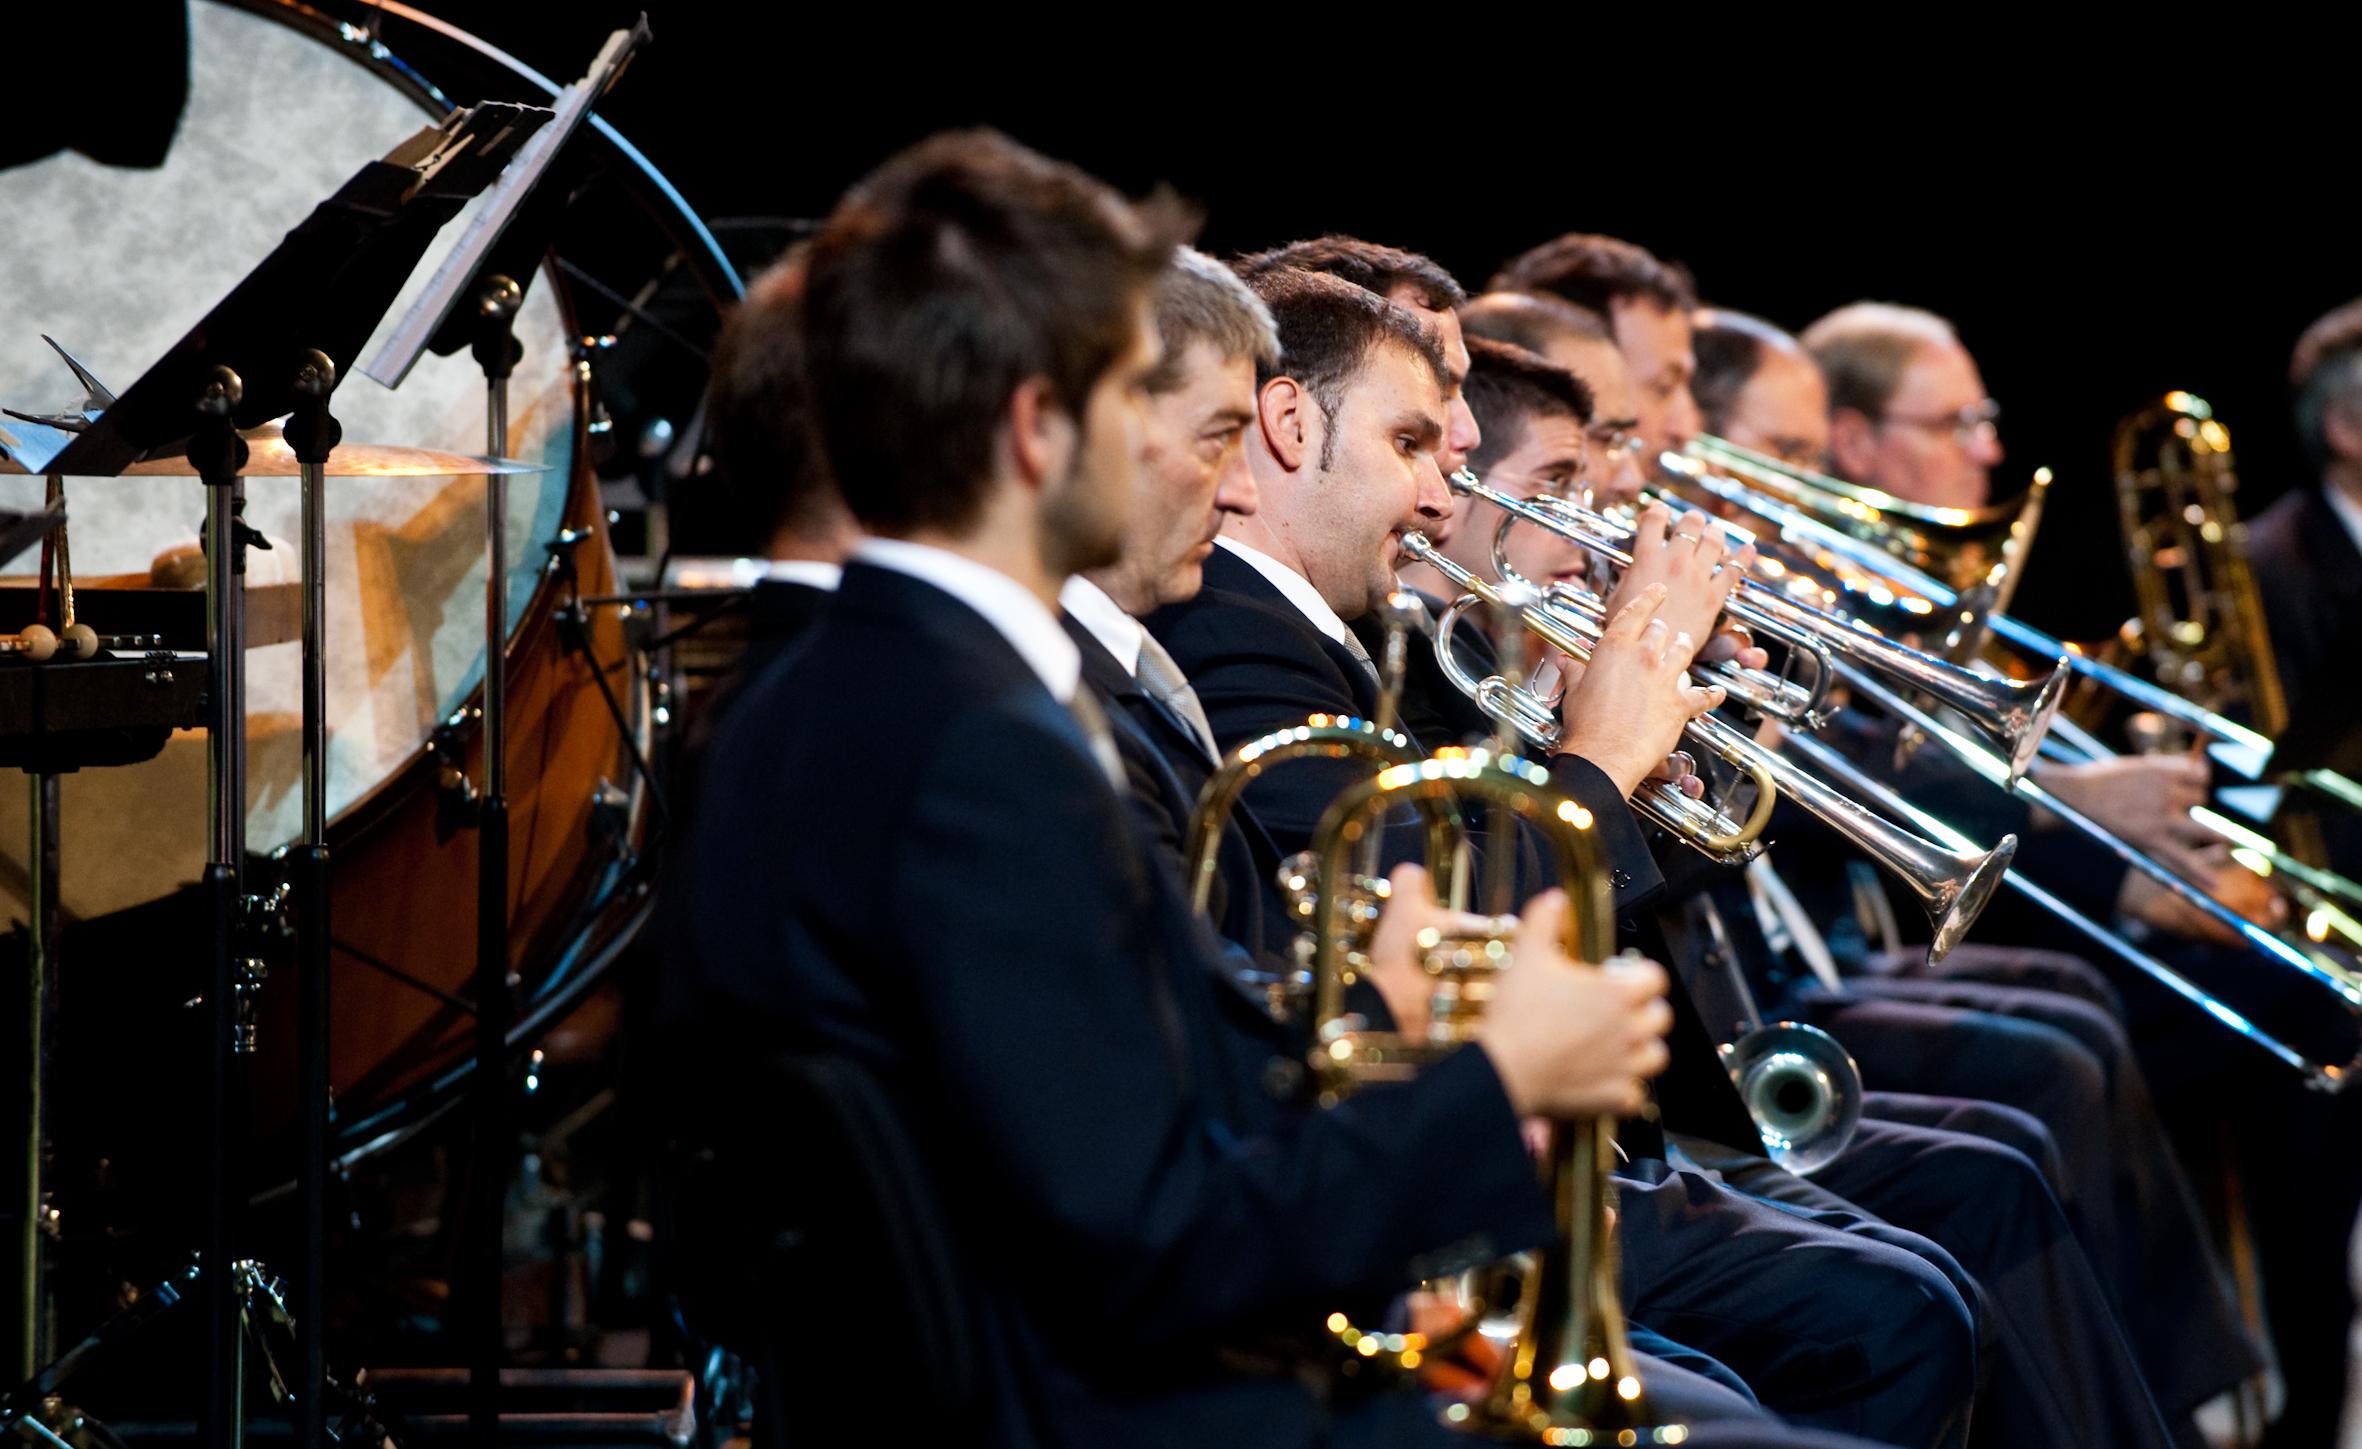 Concert Festa Major del Poblenou 2016